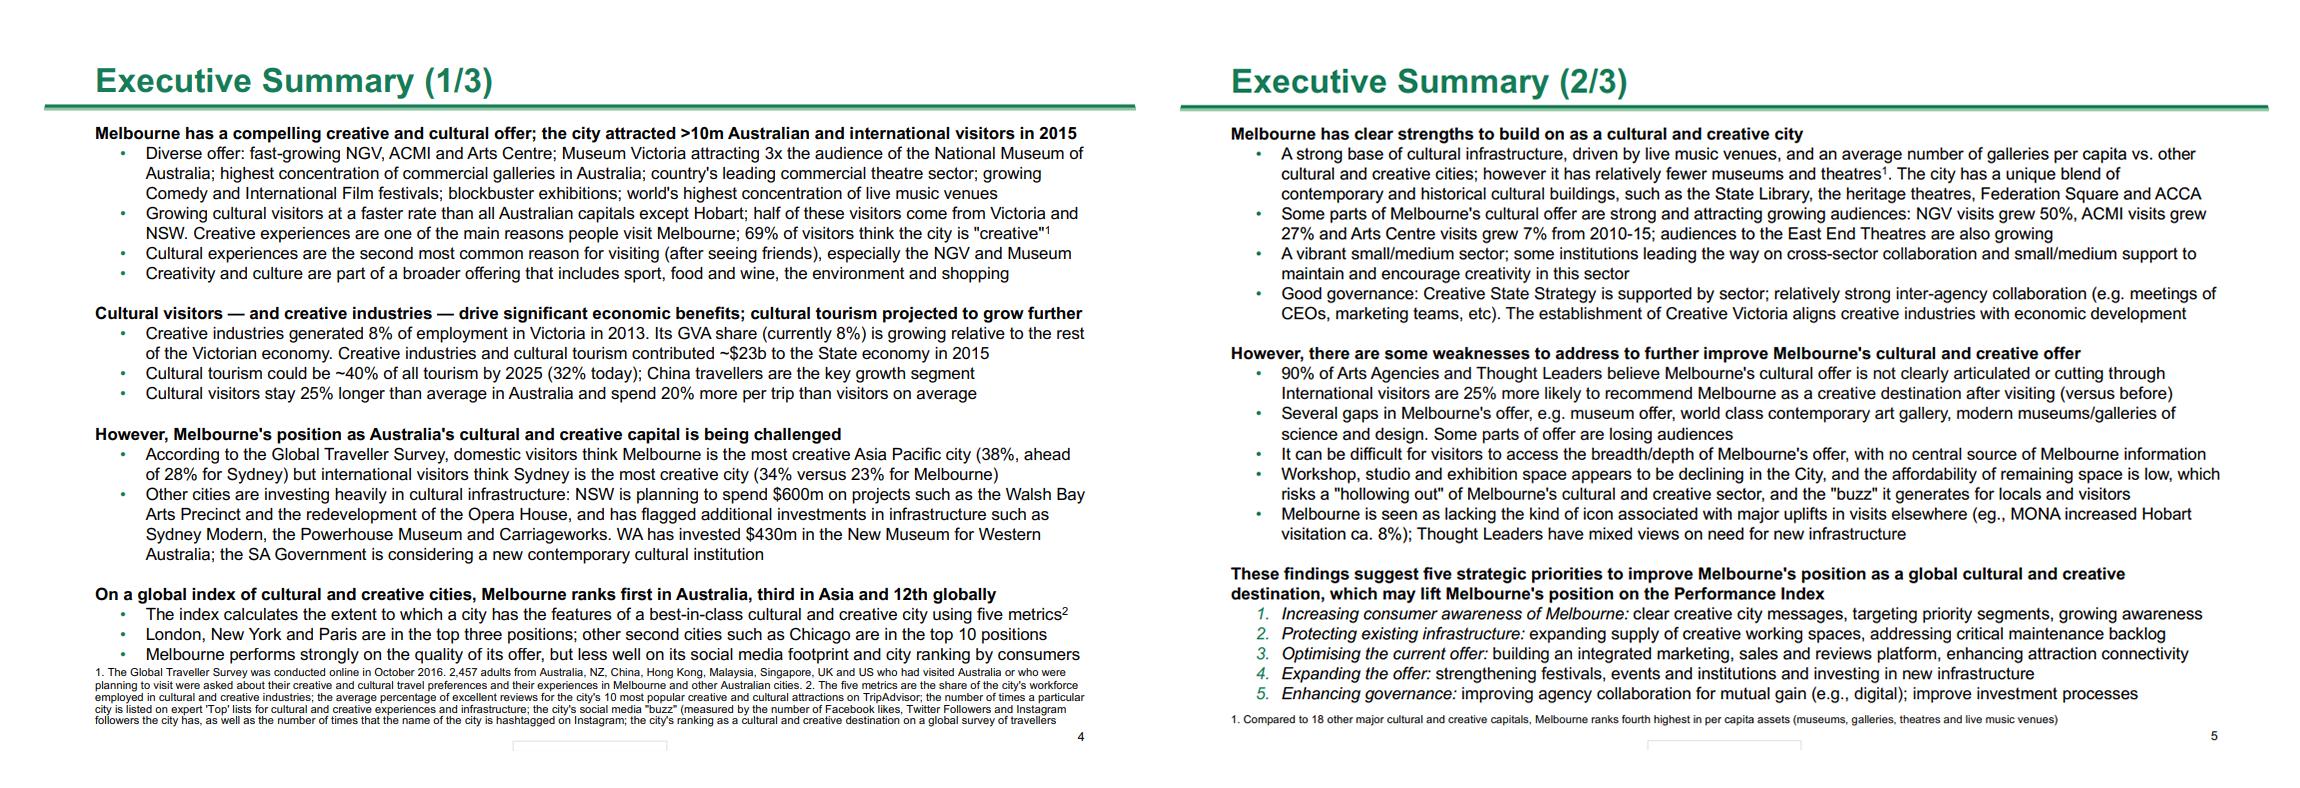 BCG Executive Summary